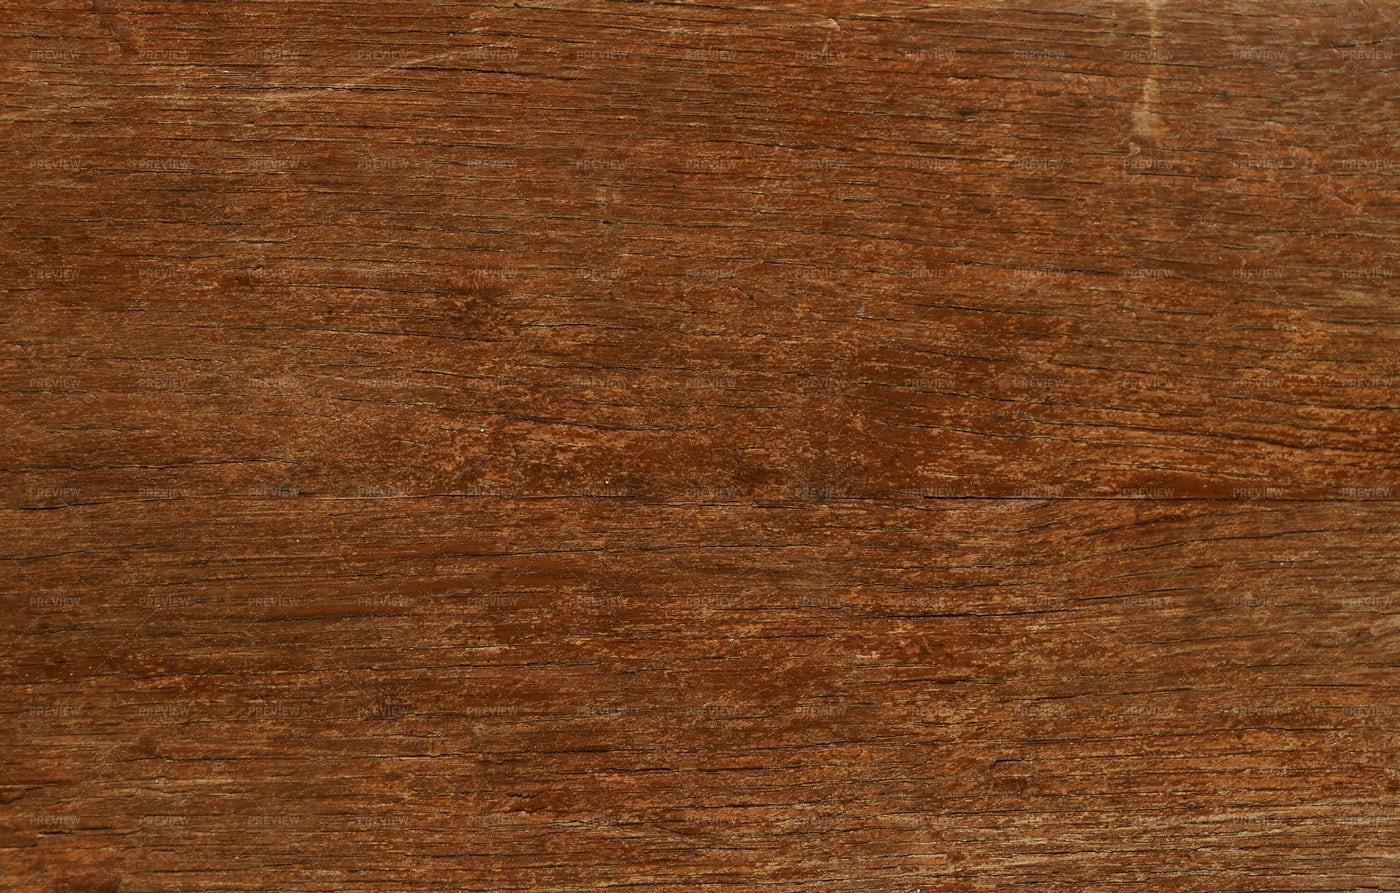 Vintage Wooden Board: Stock Photos